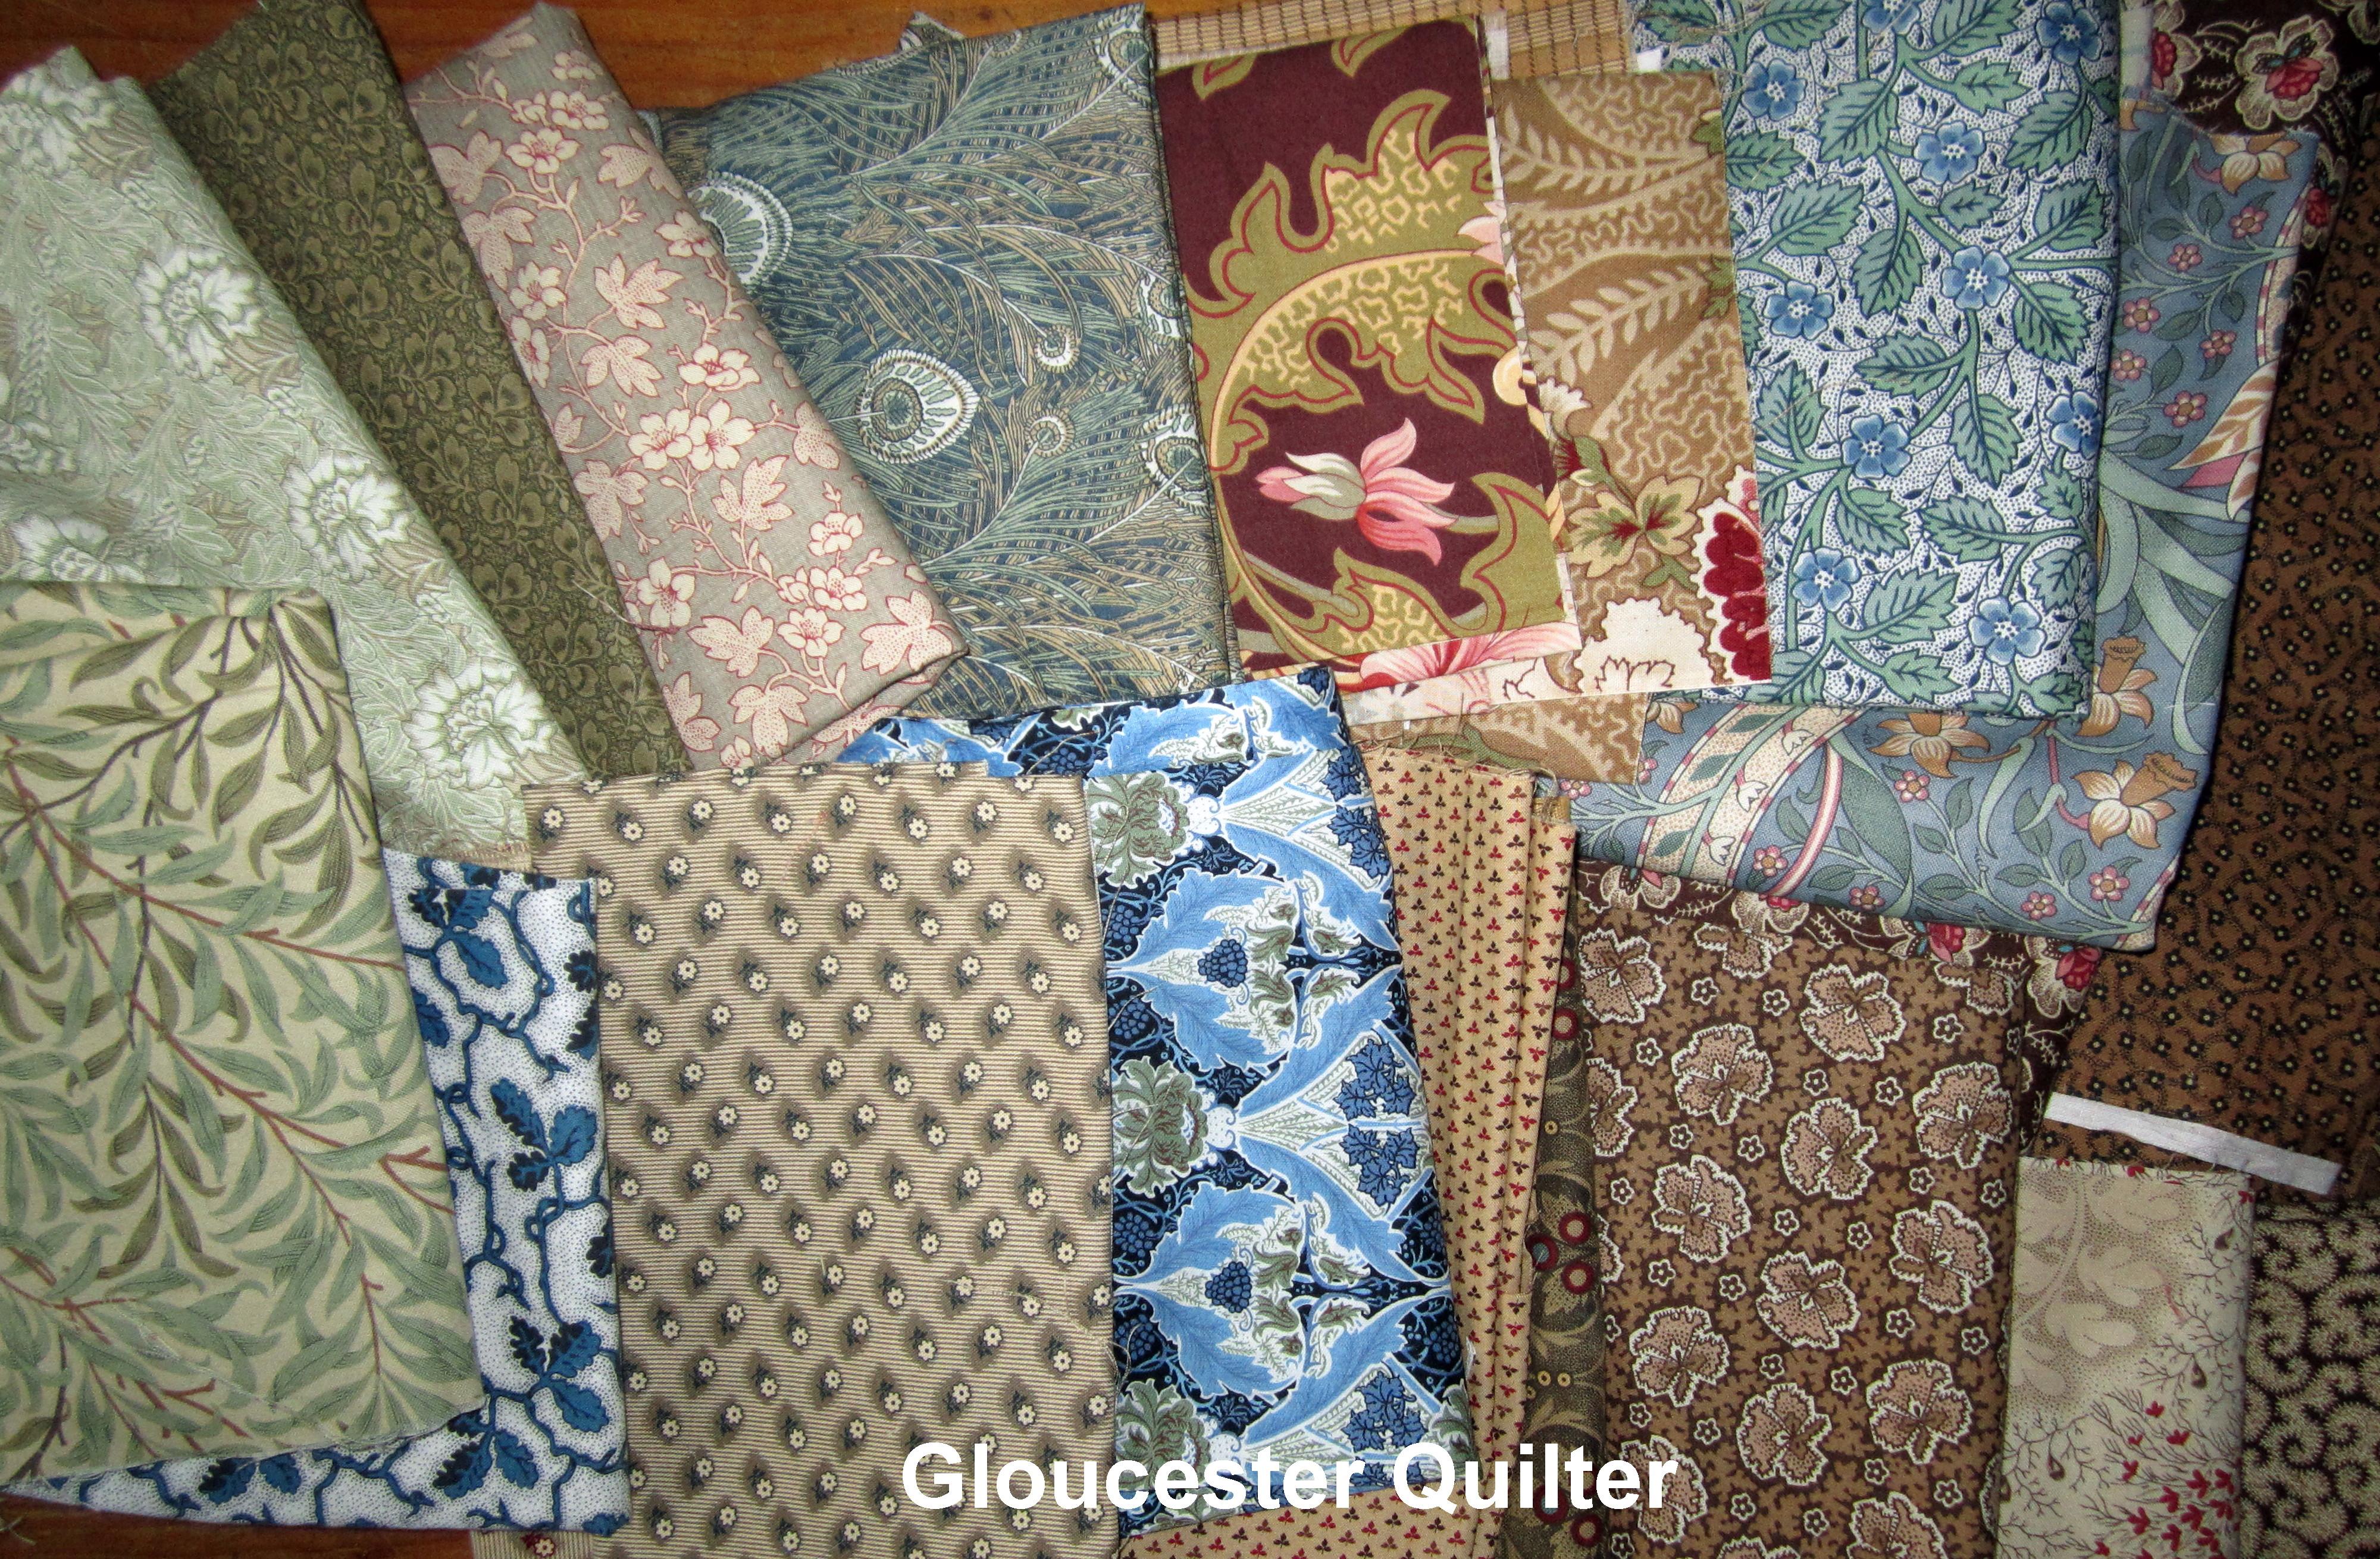 Next on Deck: Even More William Morris – Gloucester Quilter : william morris quilt patterns - Adamdwight.com